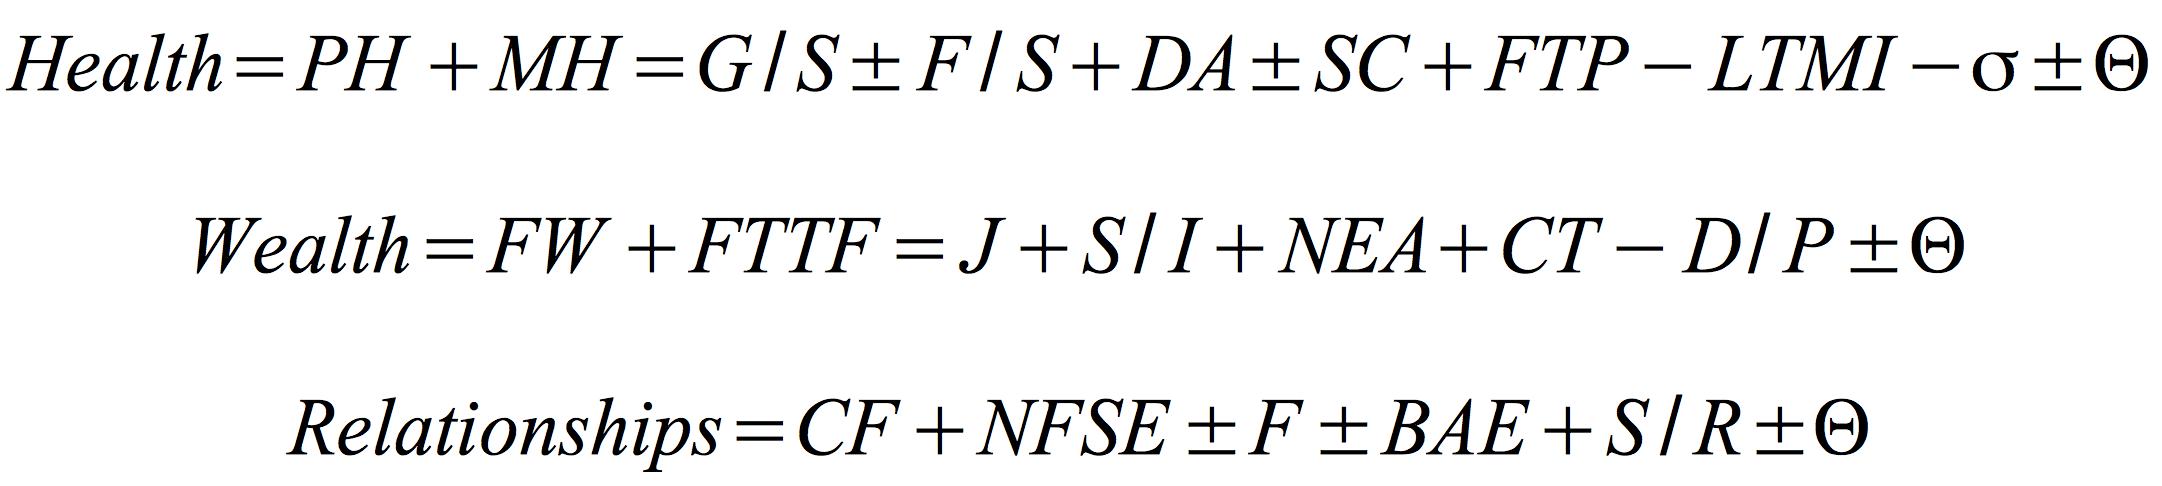 life-equations